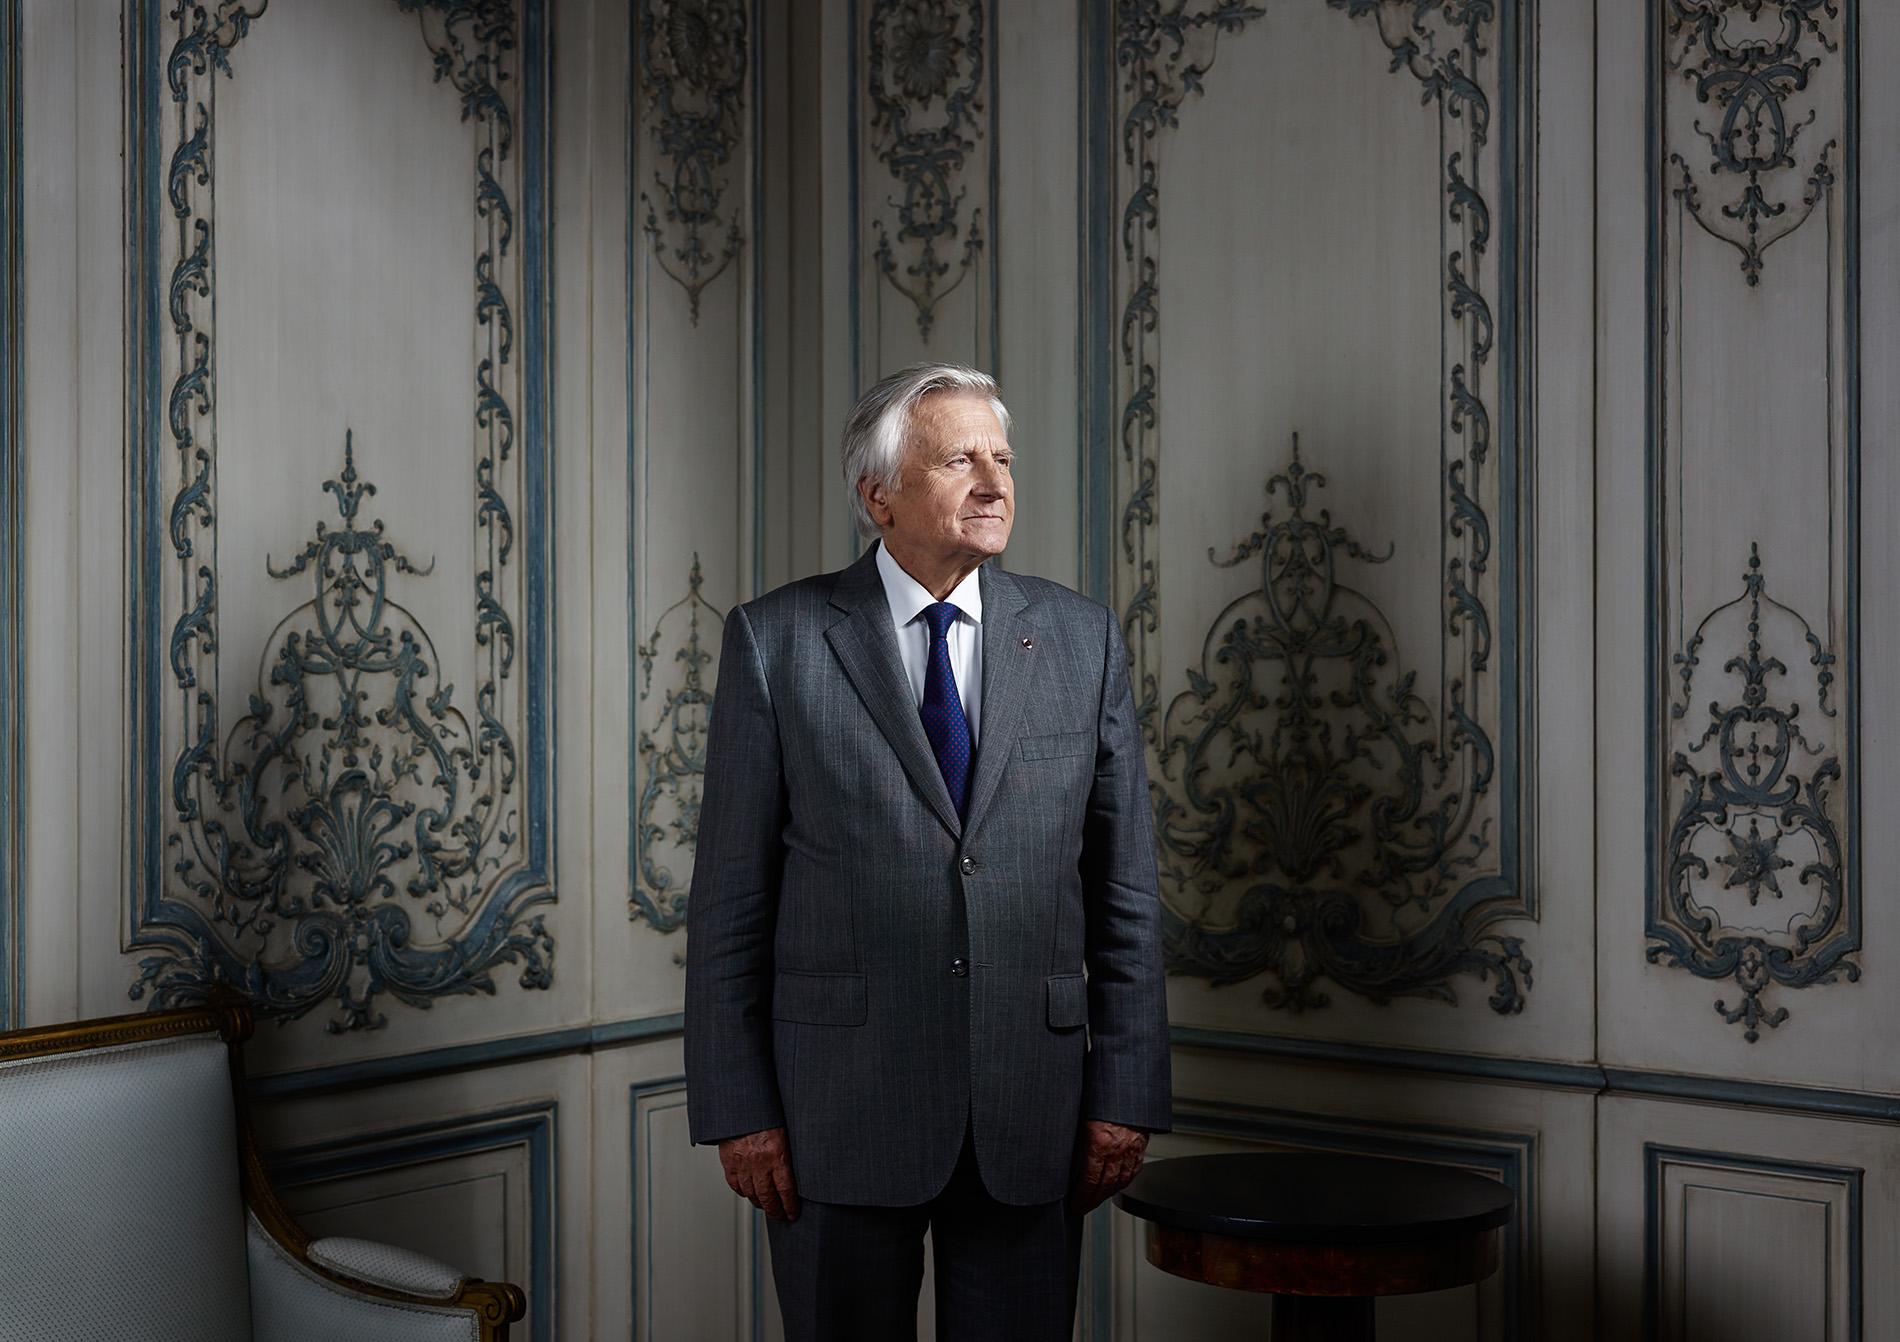 JEAN CLAUDE TRICHET  FORMER PRESIDENT BCE  FOR LE MONDE